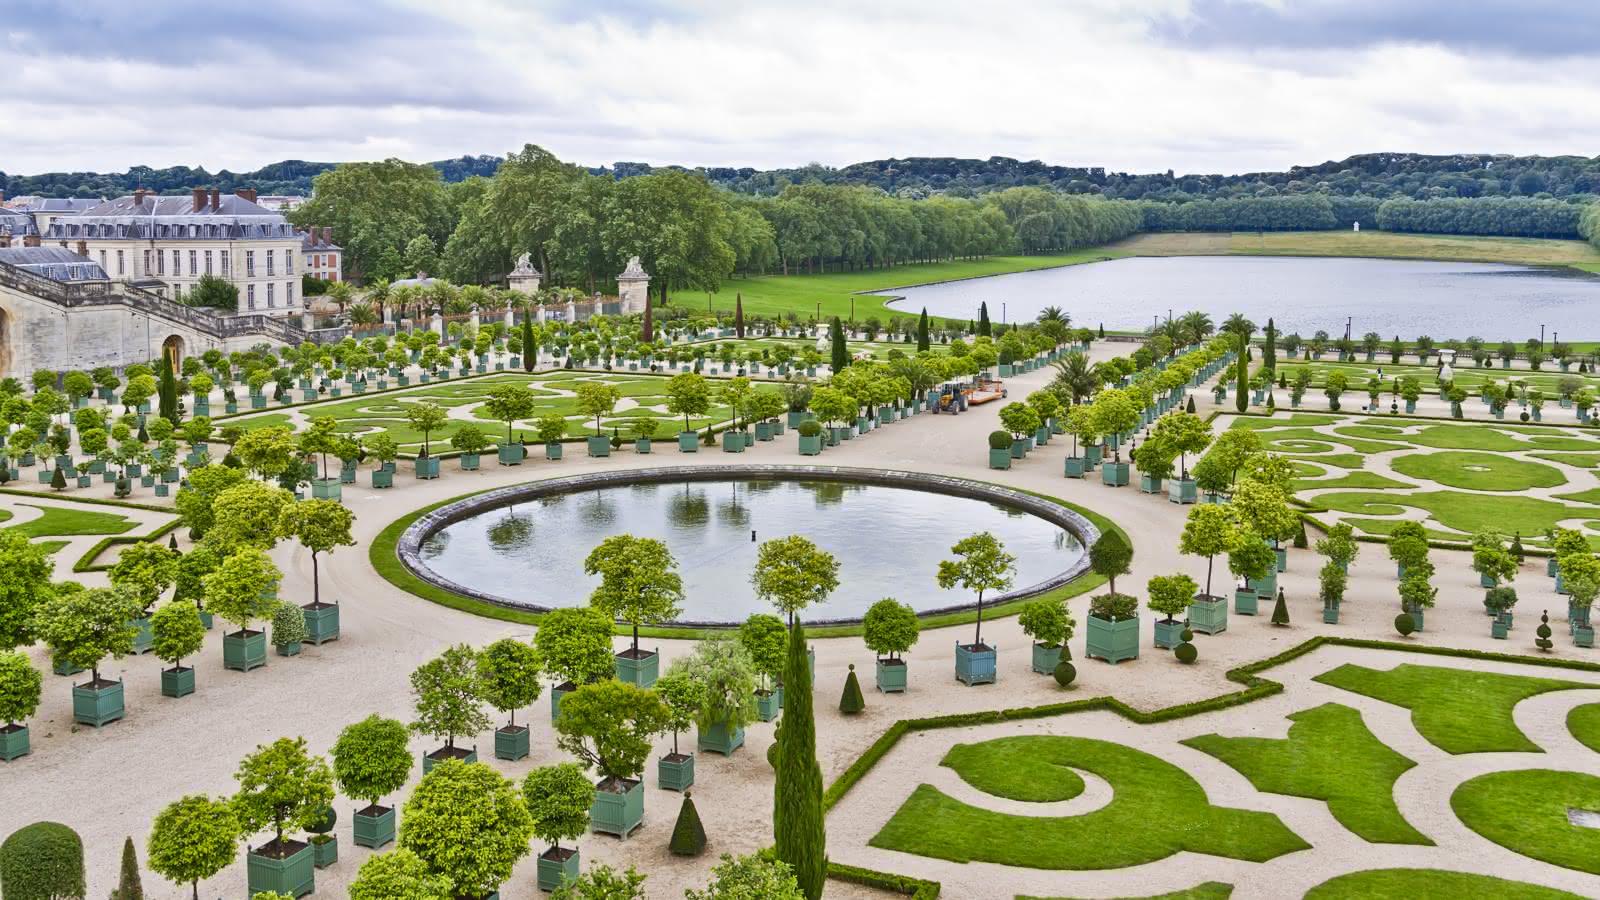 versailles gardens tour from paris